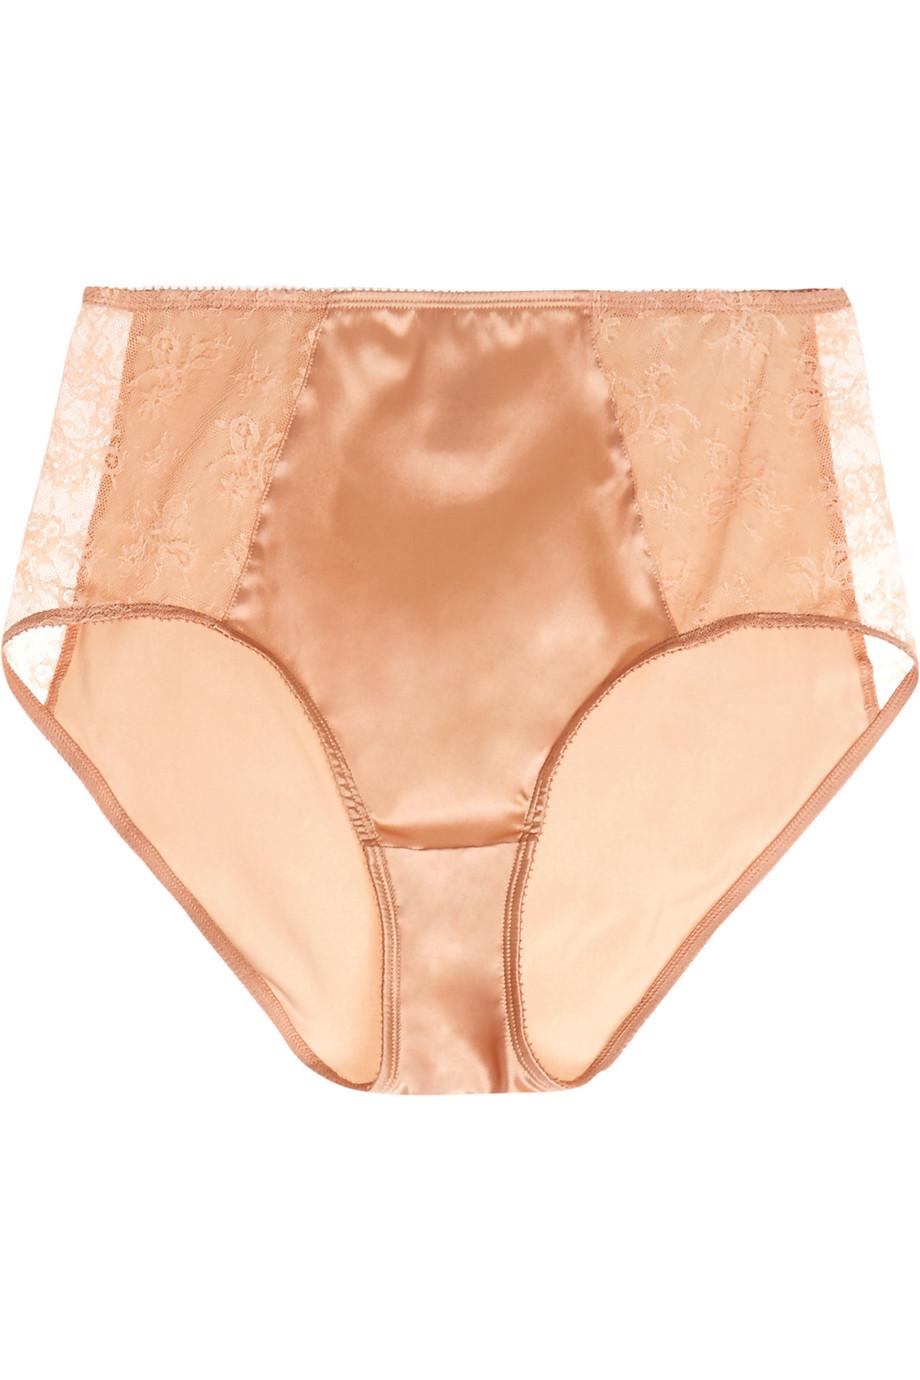 Eres Charivari Leavers Lace-Paneled Stretch-Satin Briefs, Sand, Women's, Size: 38